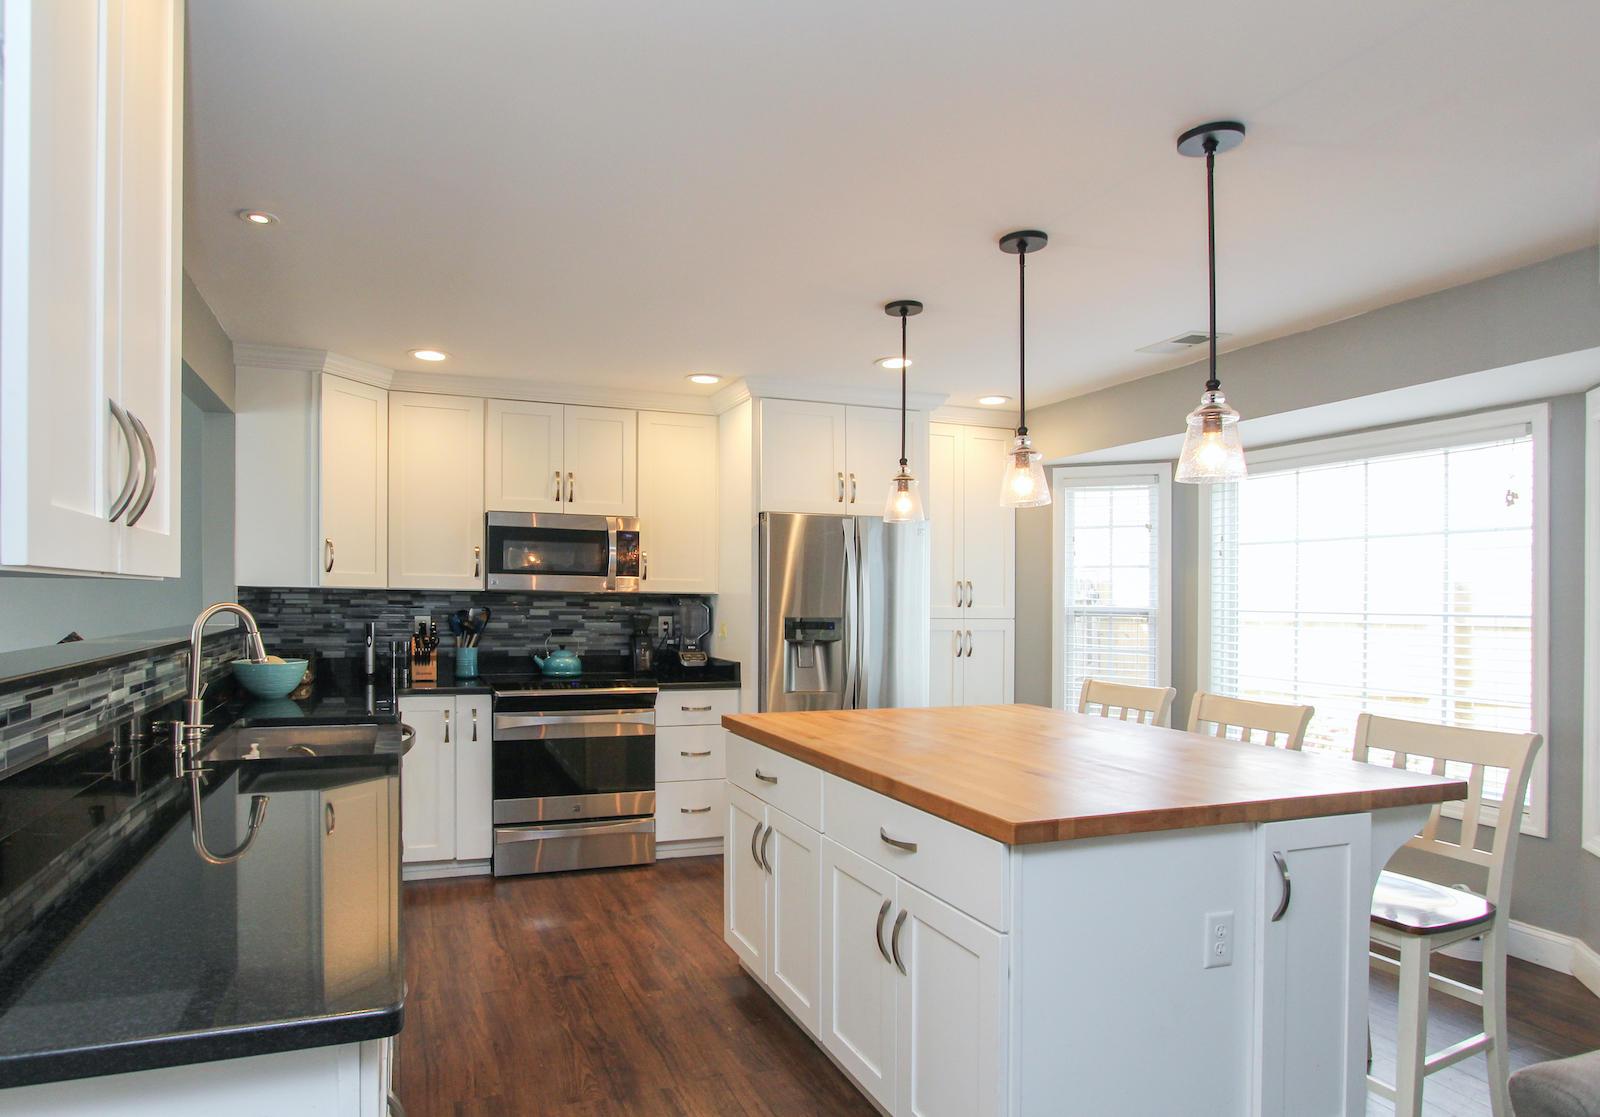 Landings Run Homes For Sale - 1548 Wickfield, Mount Pleasant, SC - 20